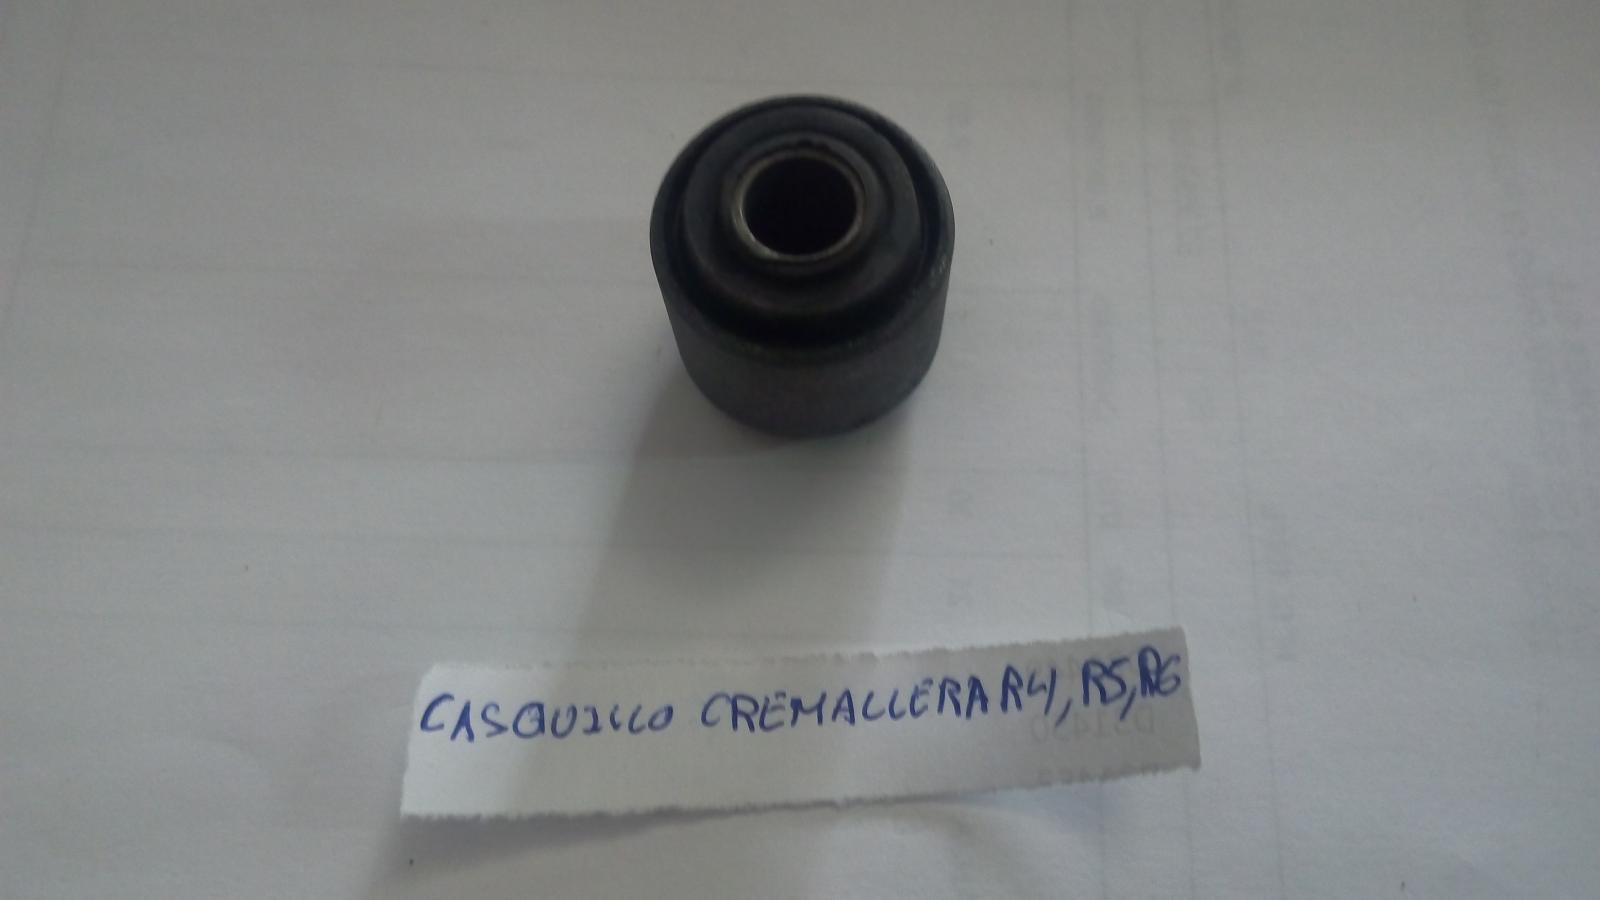 CASQUILLO CREMALLERA R4 R5 R6